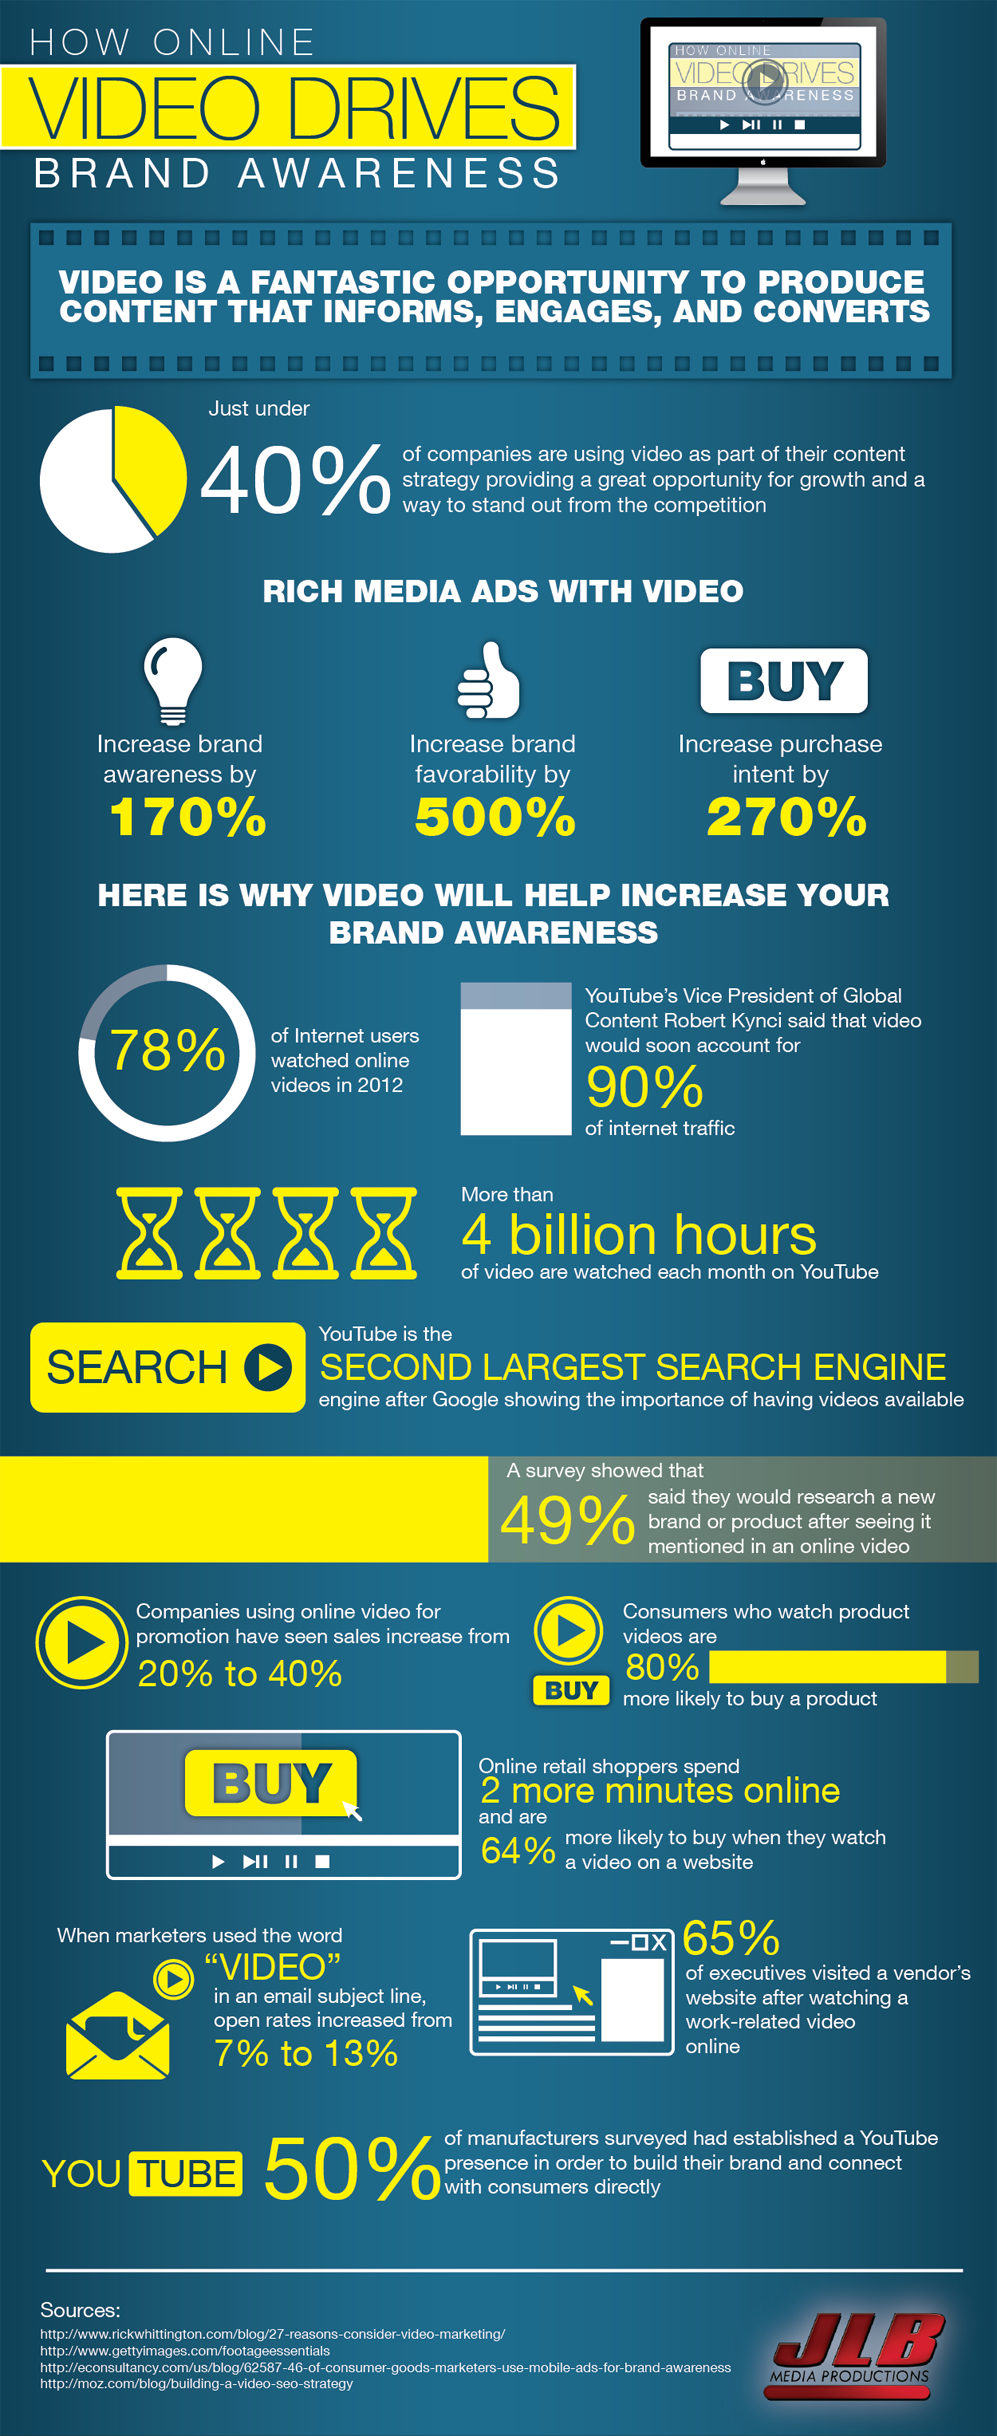 video-drives-brand-awareness